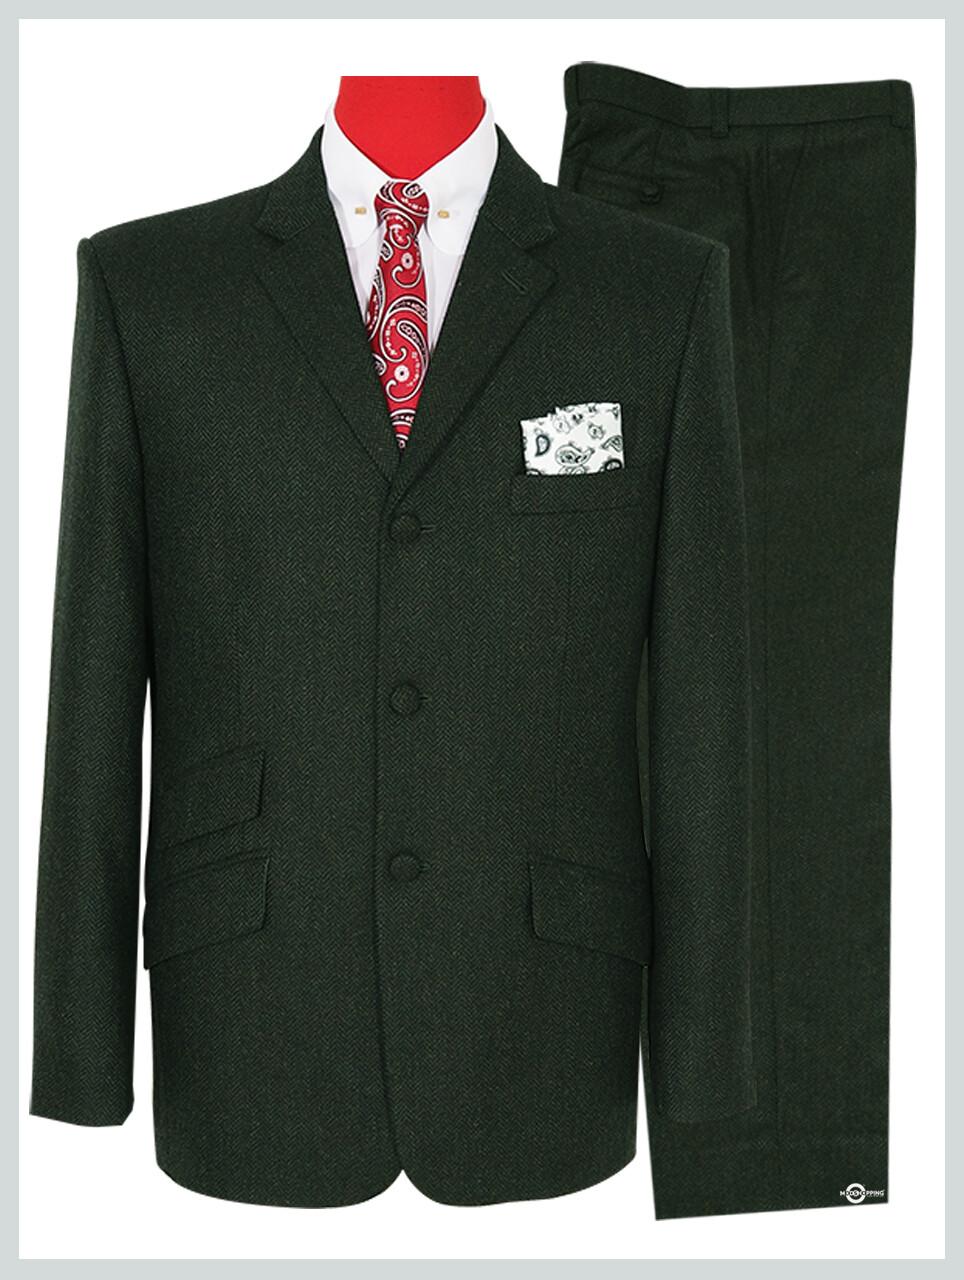 Mod Tweed Suit | Olive Green Herringbone Mod Suit